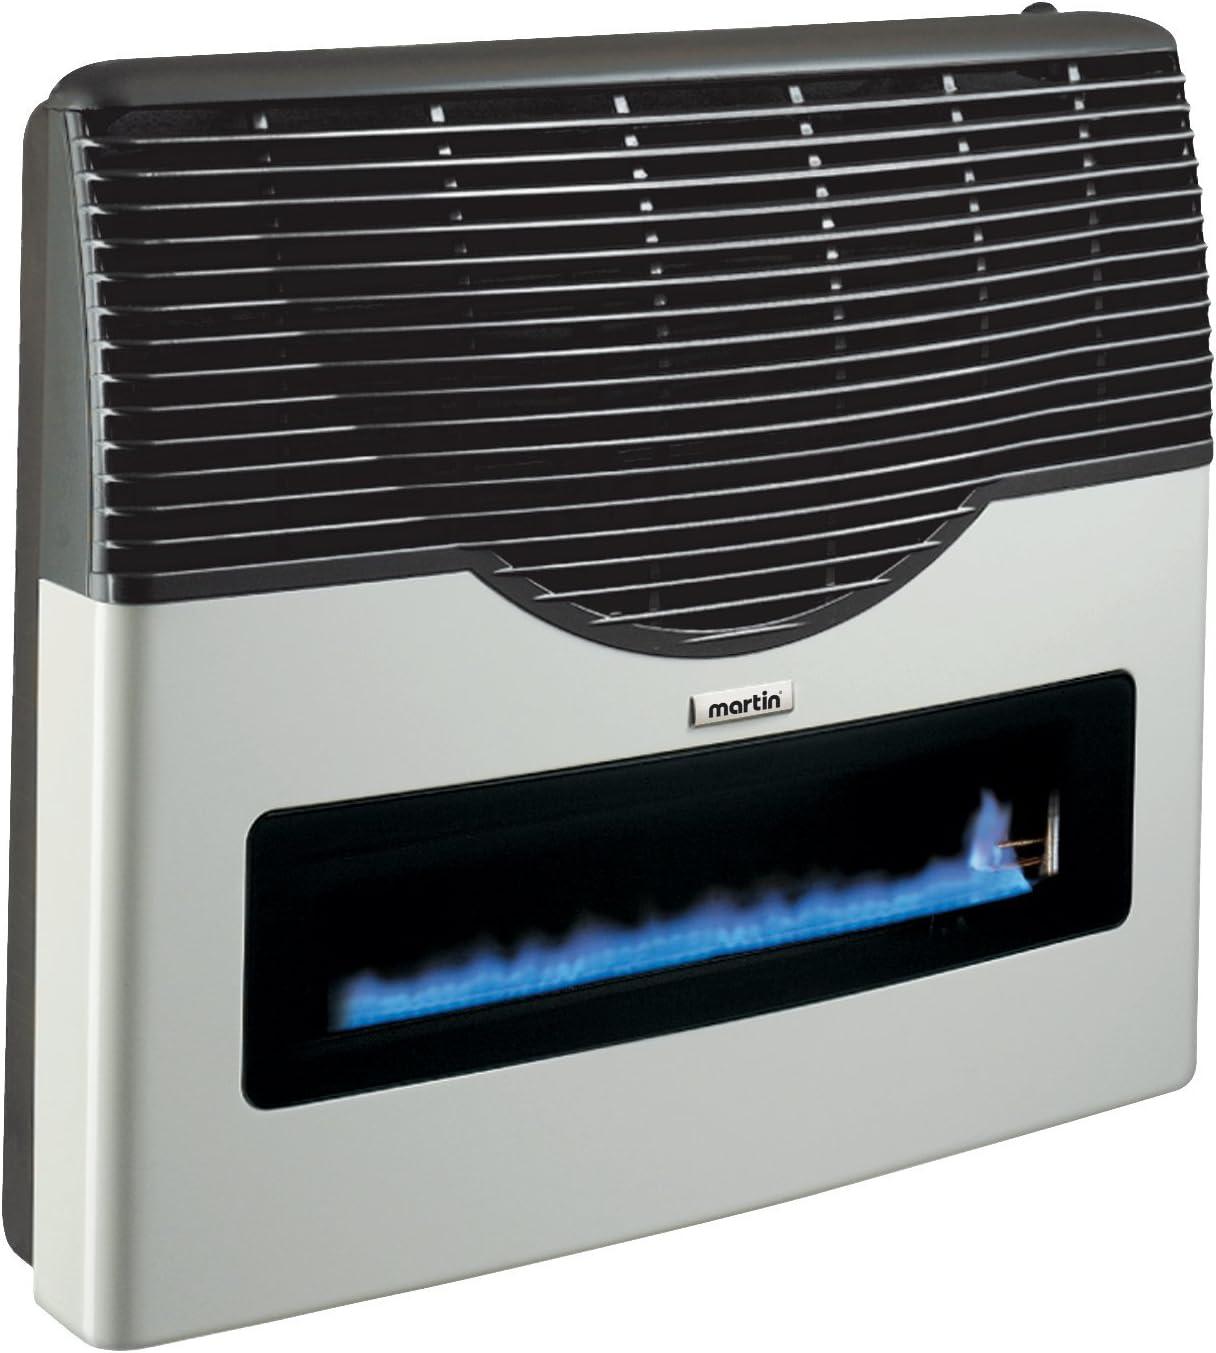 Martin Direct Vent Propane Wall Furnace Heater